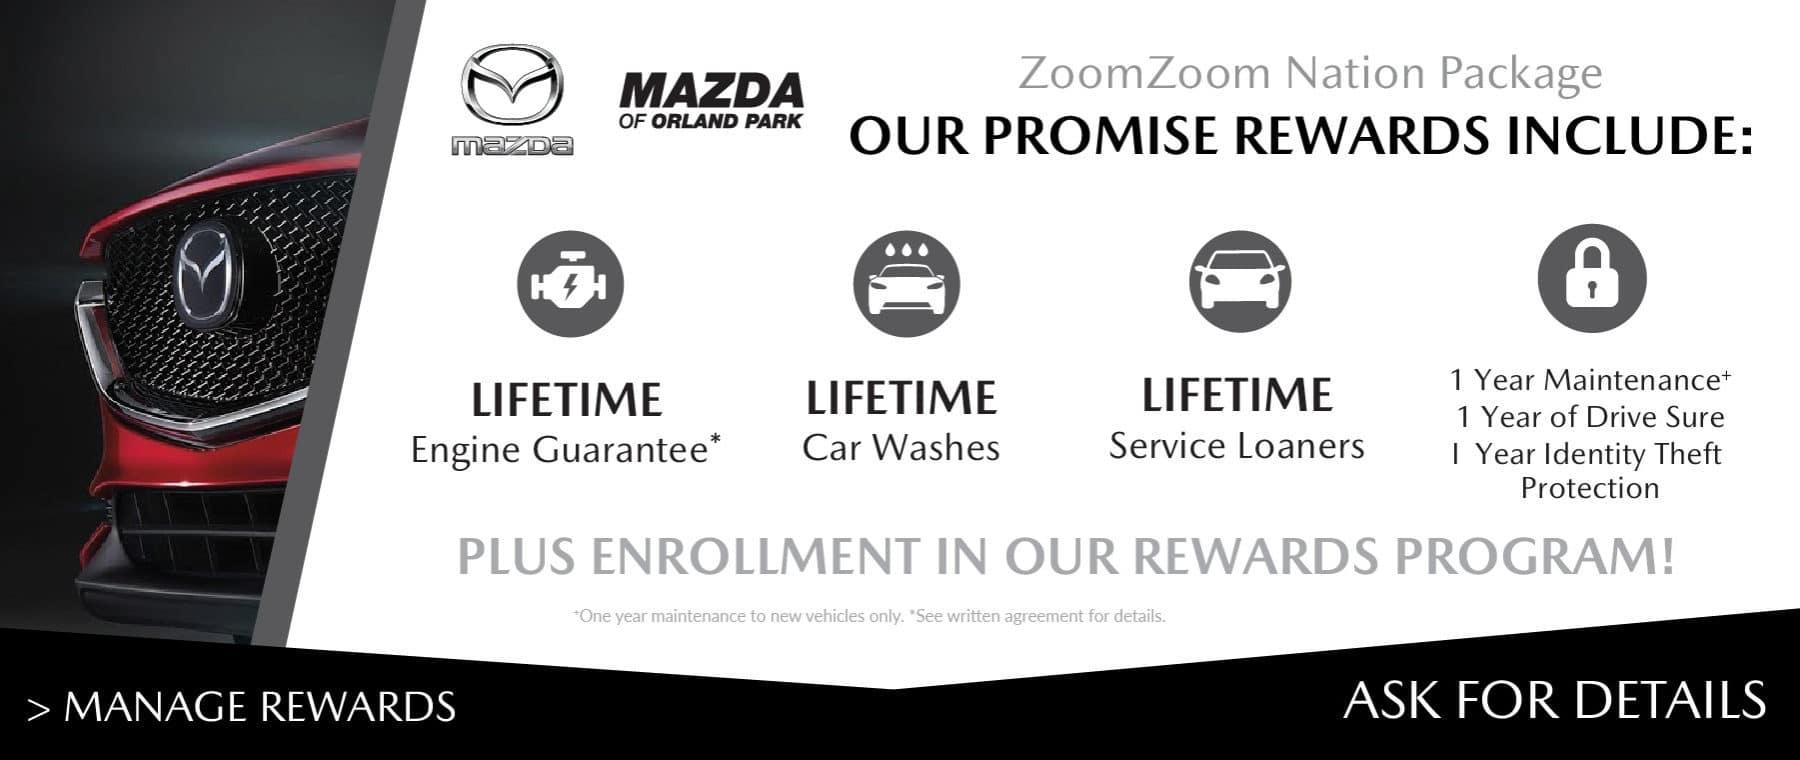 MazdaofOrlandPark_RewardsWebBanner-02